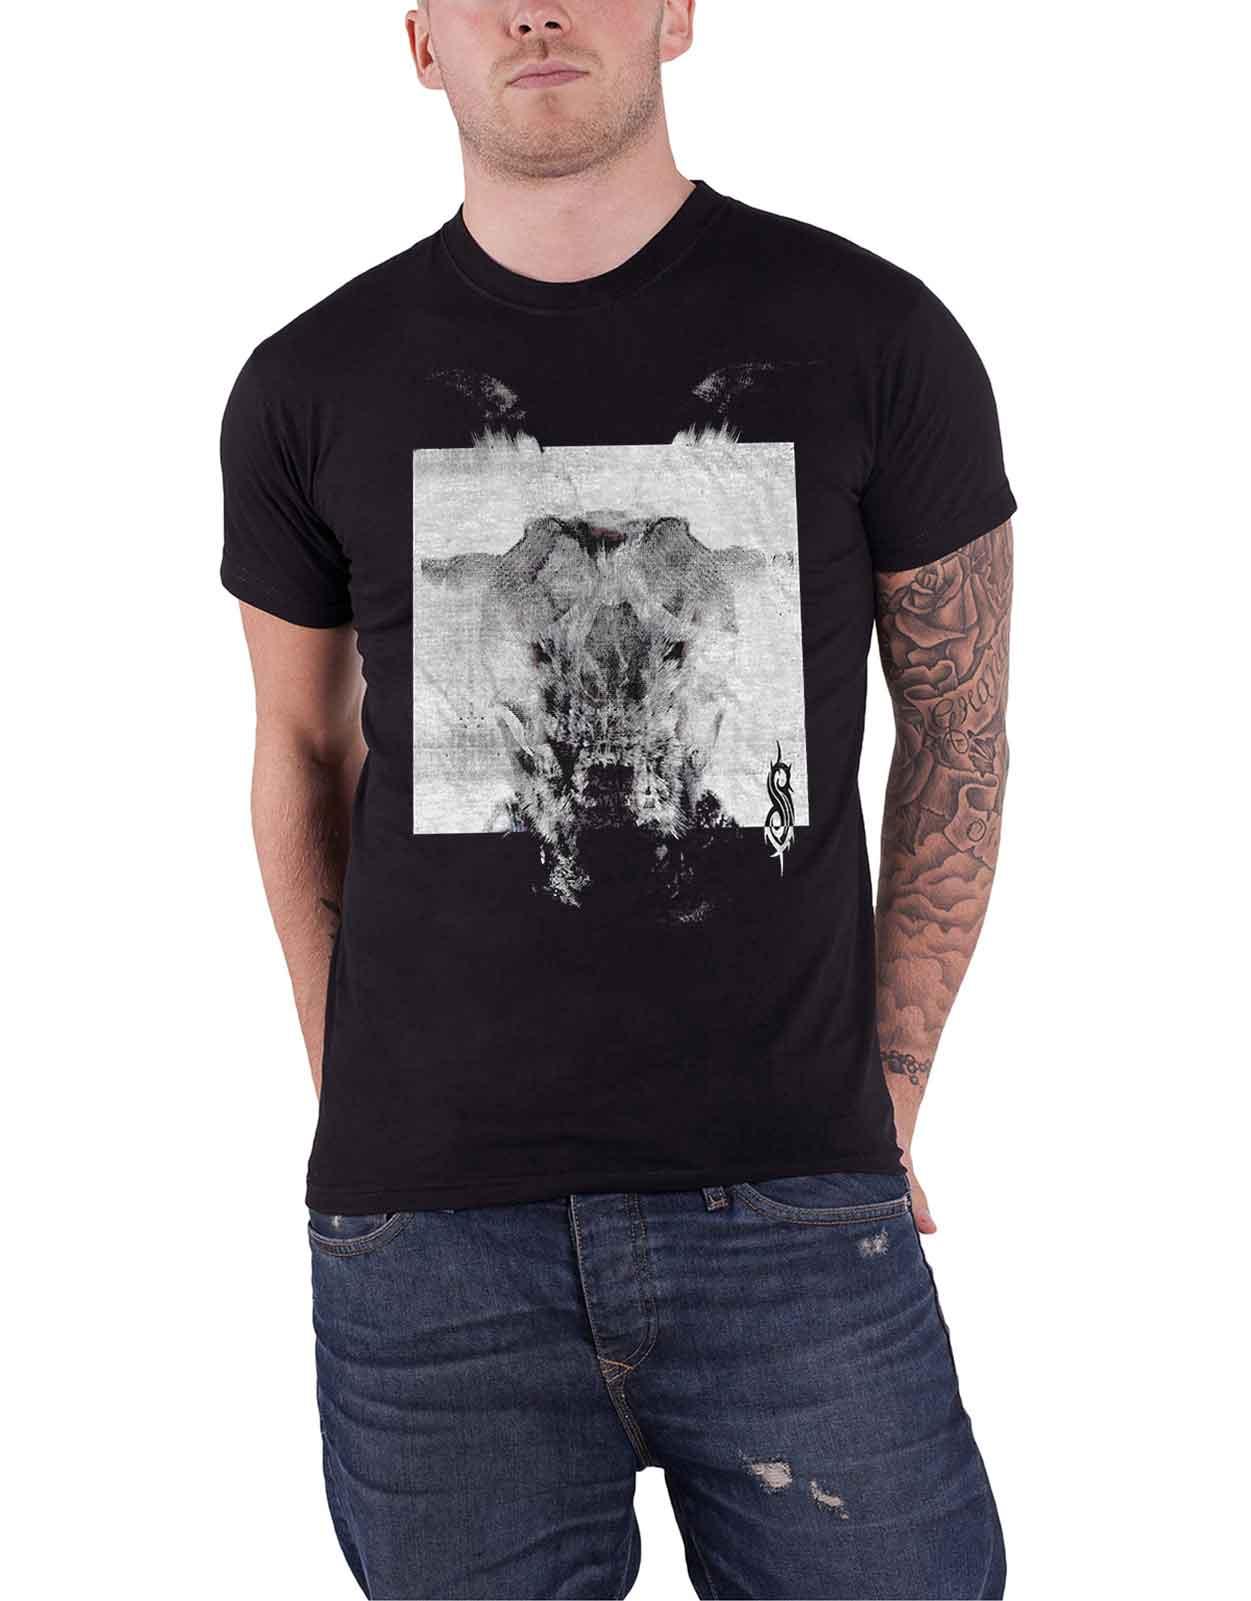 Details about Slipknot T Shirt All Out Life Devil Single Black & White new  Official Mens Black